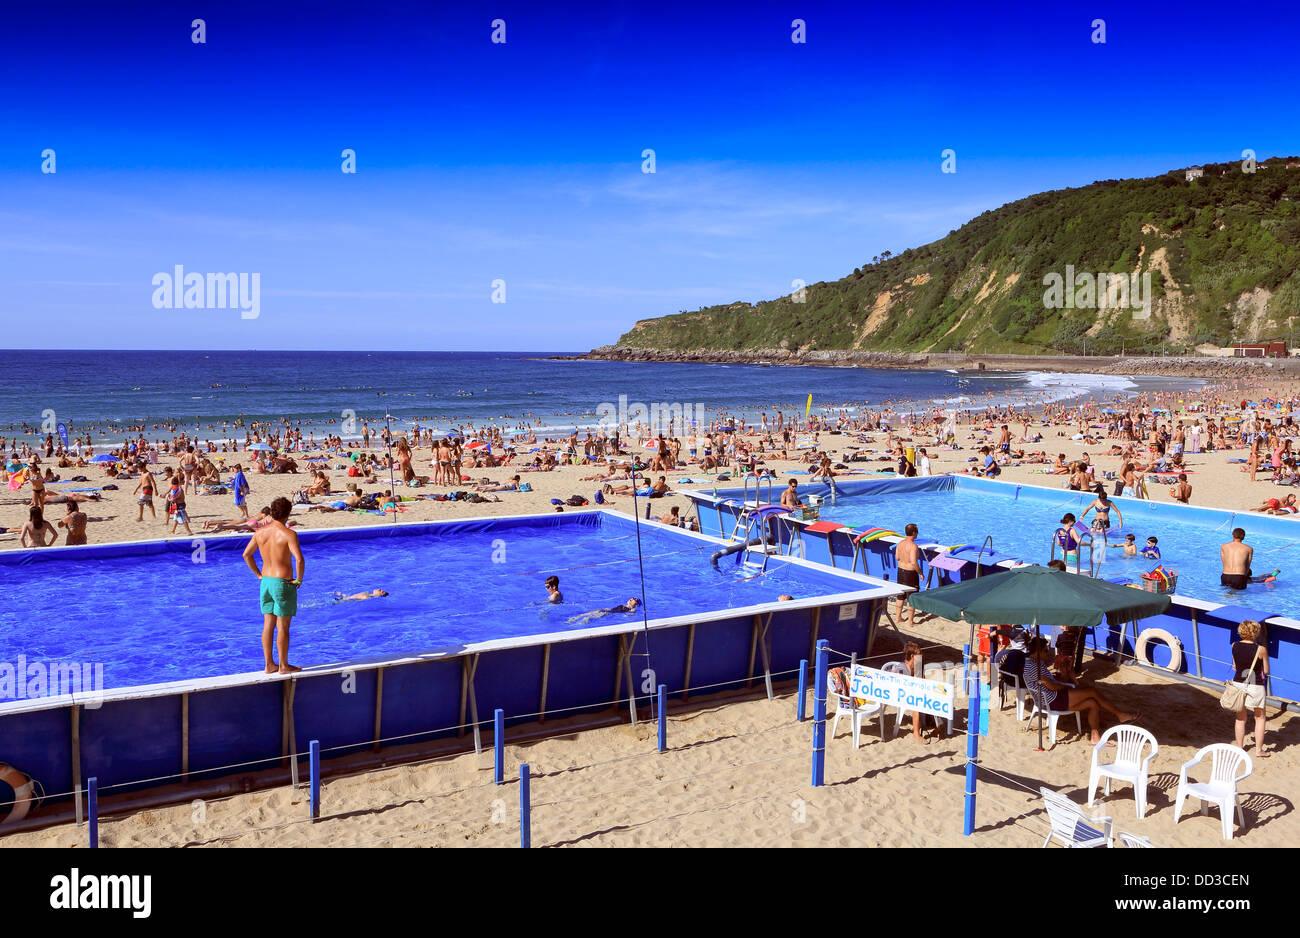 Swimming Pool Uses : Swim swimming hot heat friends stock photos